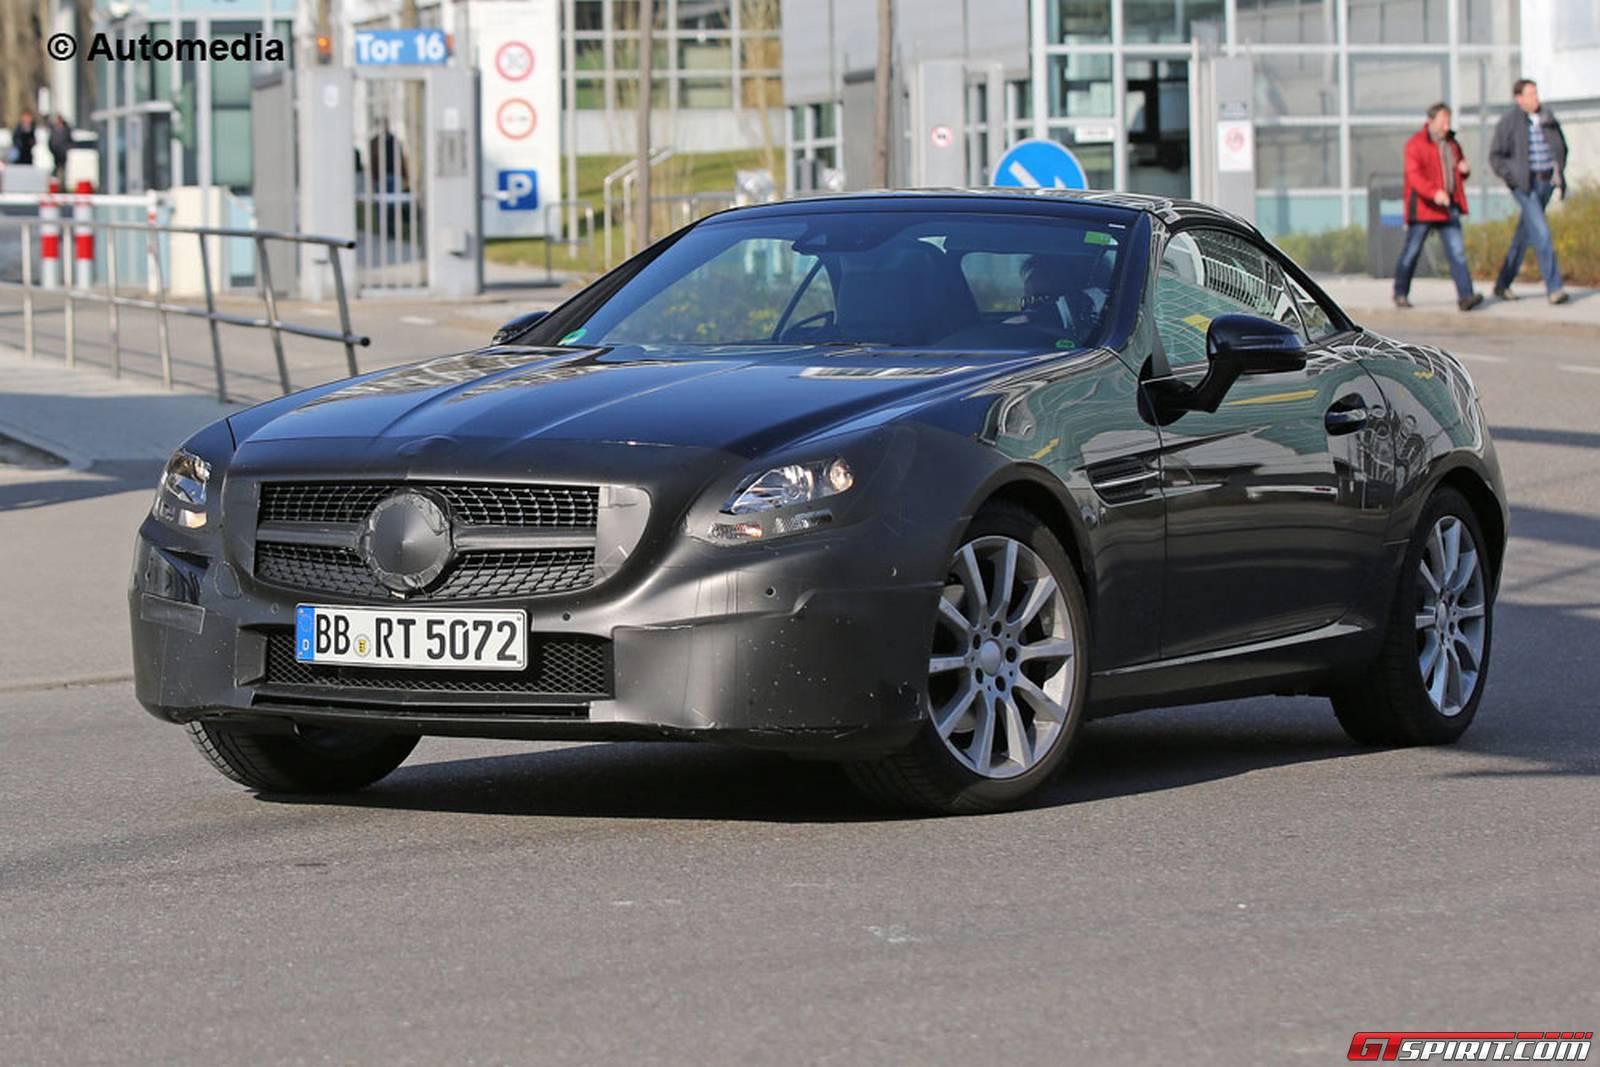 Mercedes Benz Slc Spy Shots Emerge Again Gtspirit